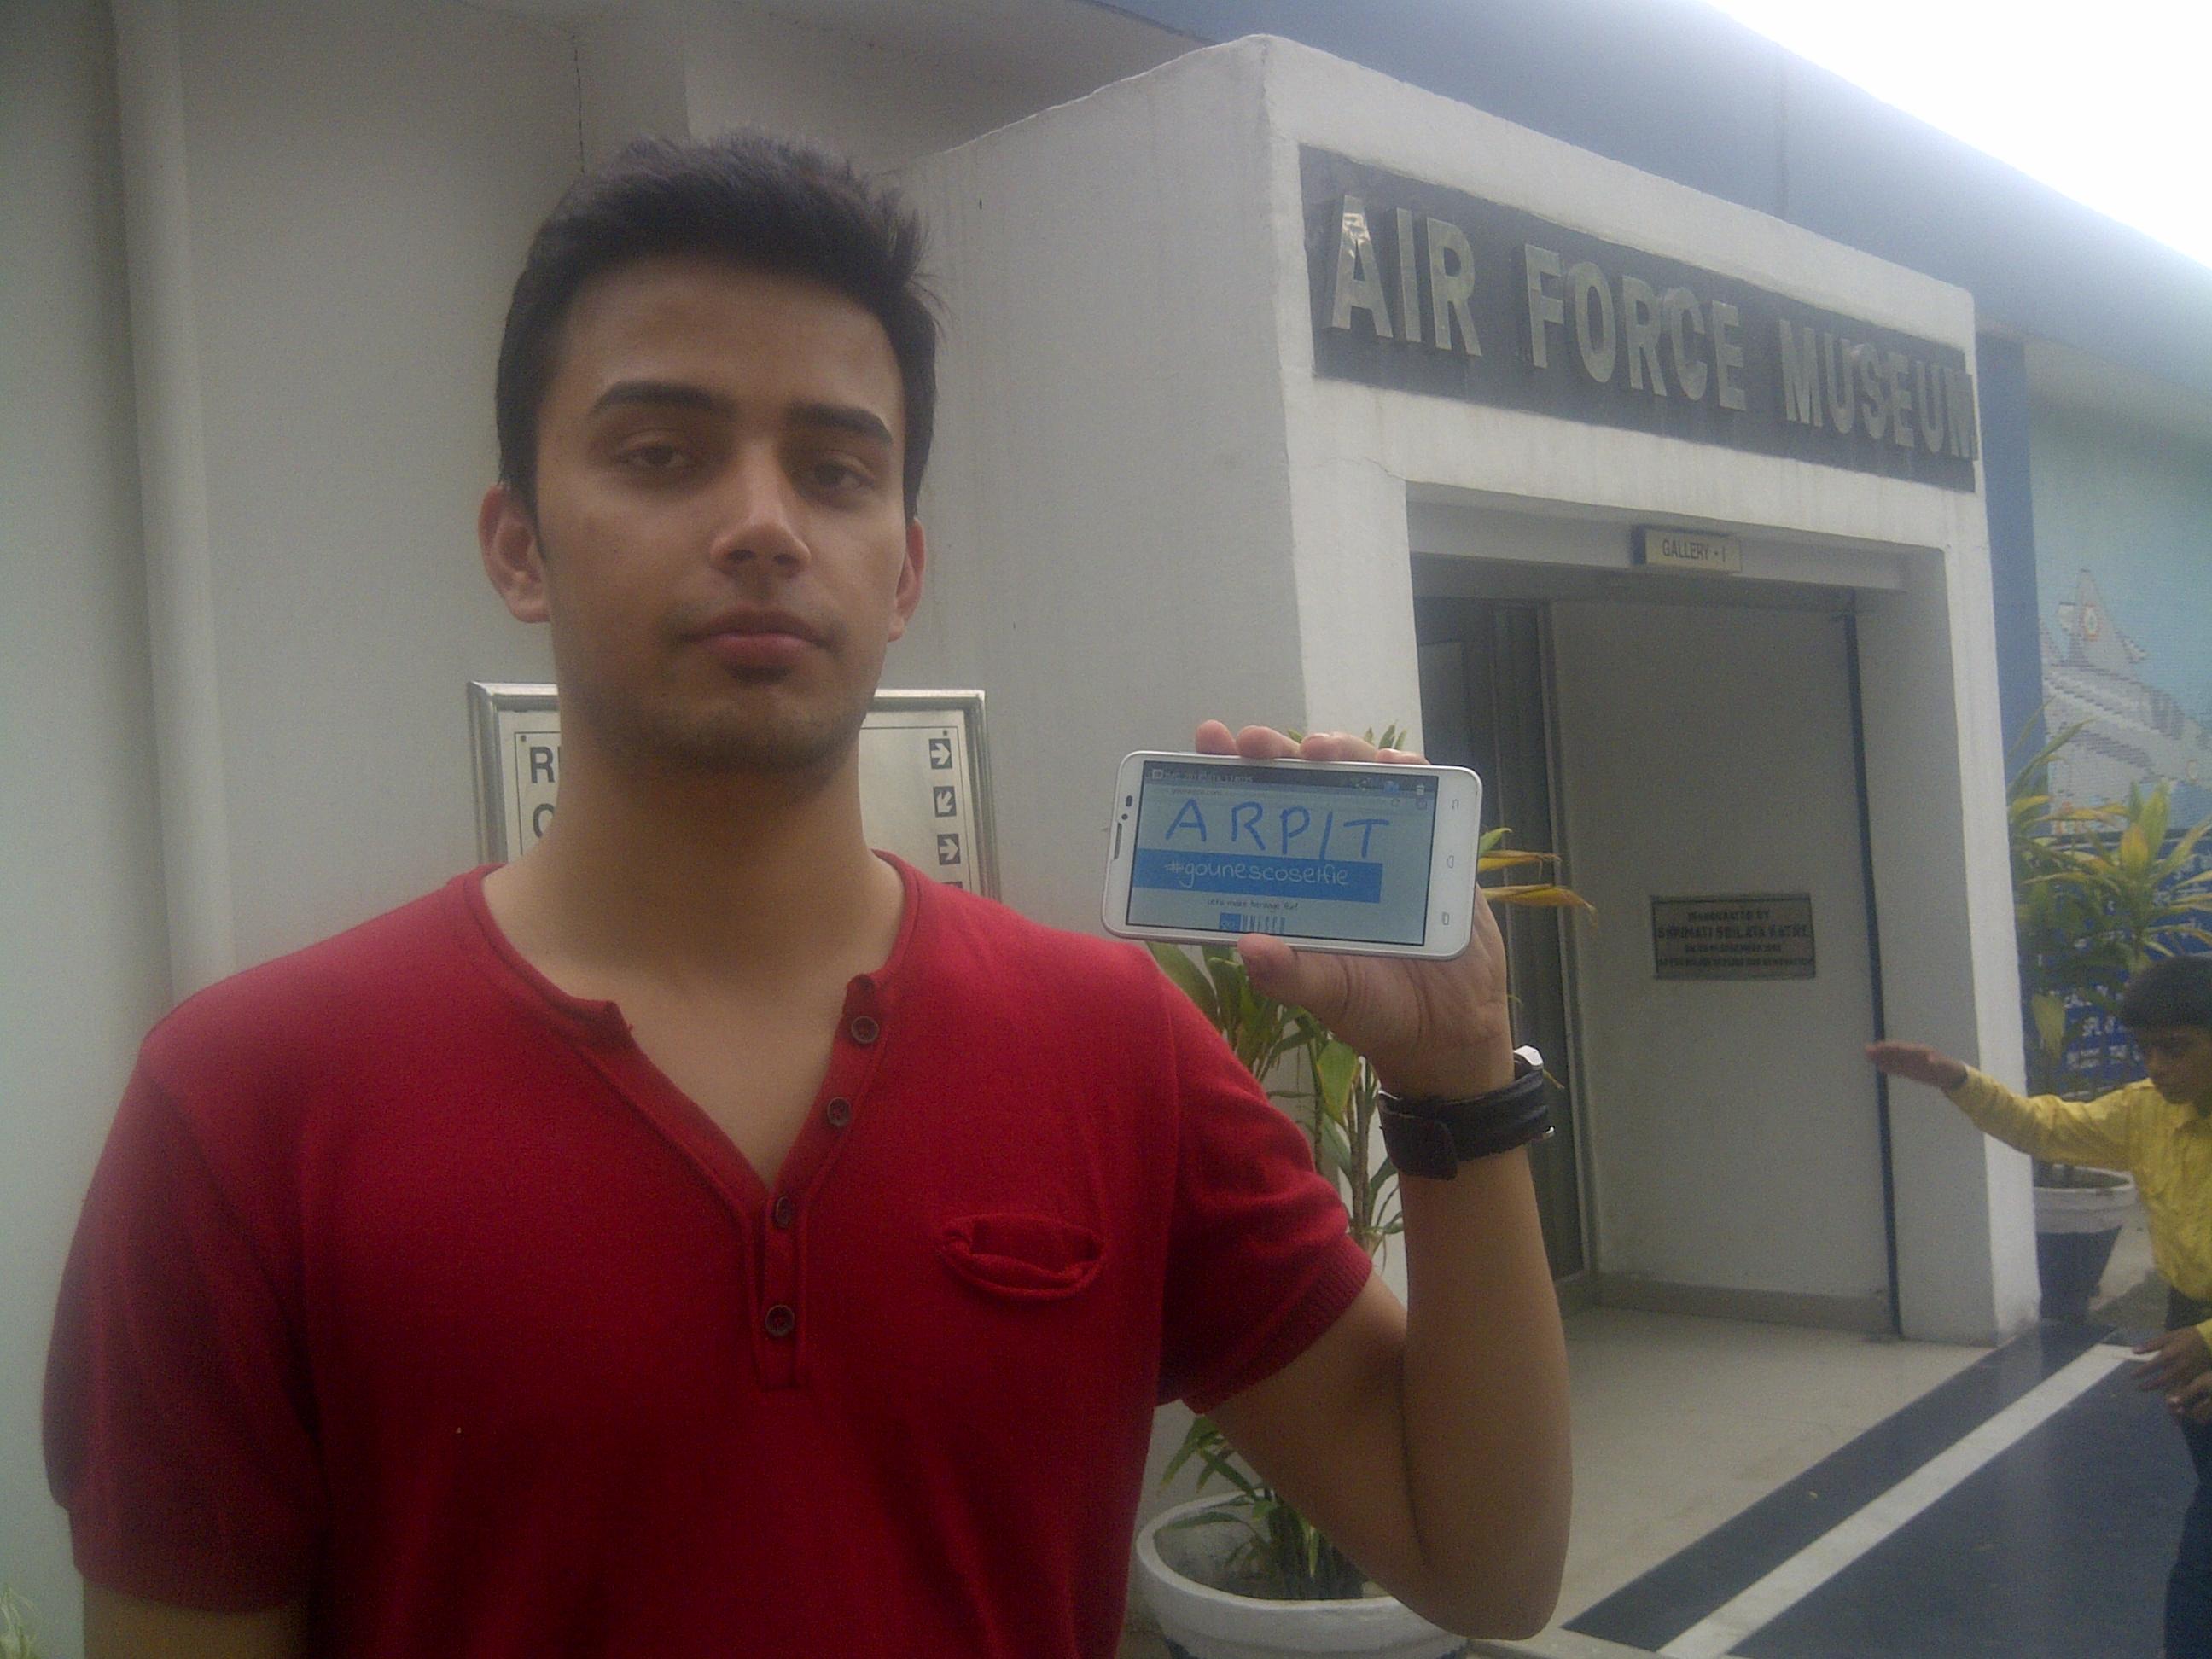 The Indian Air Force Museum, Palam Arpit Singh